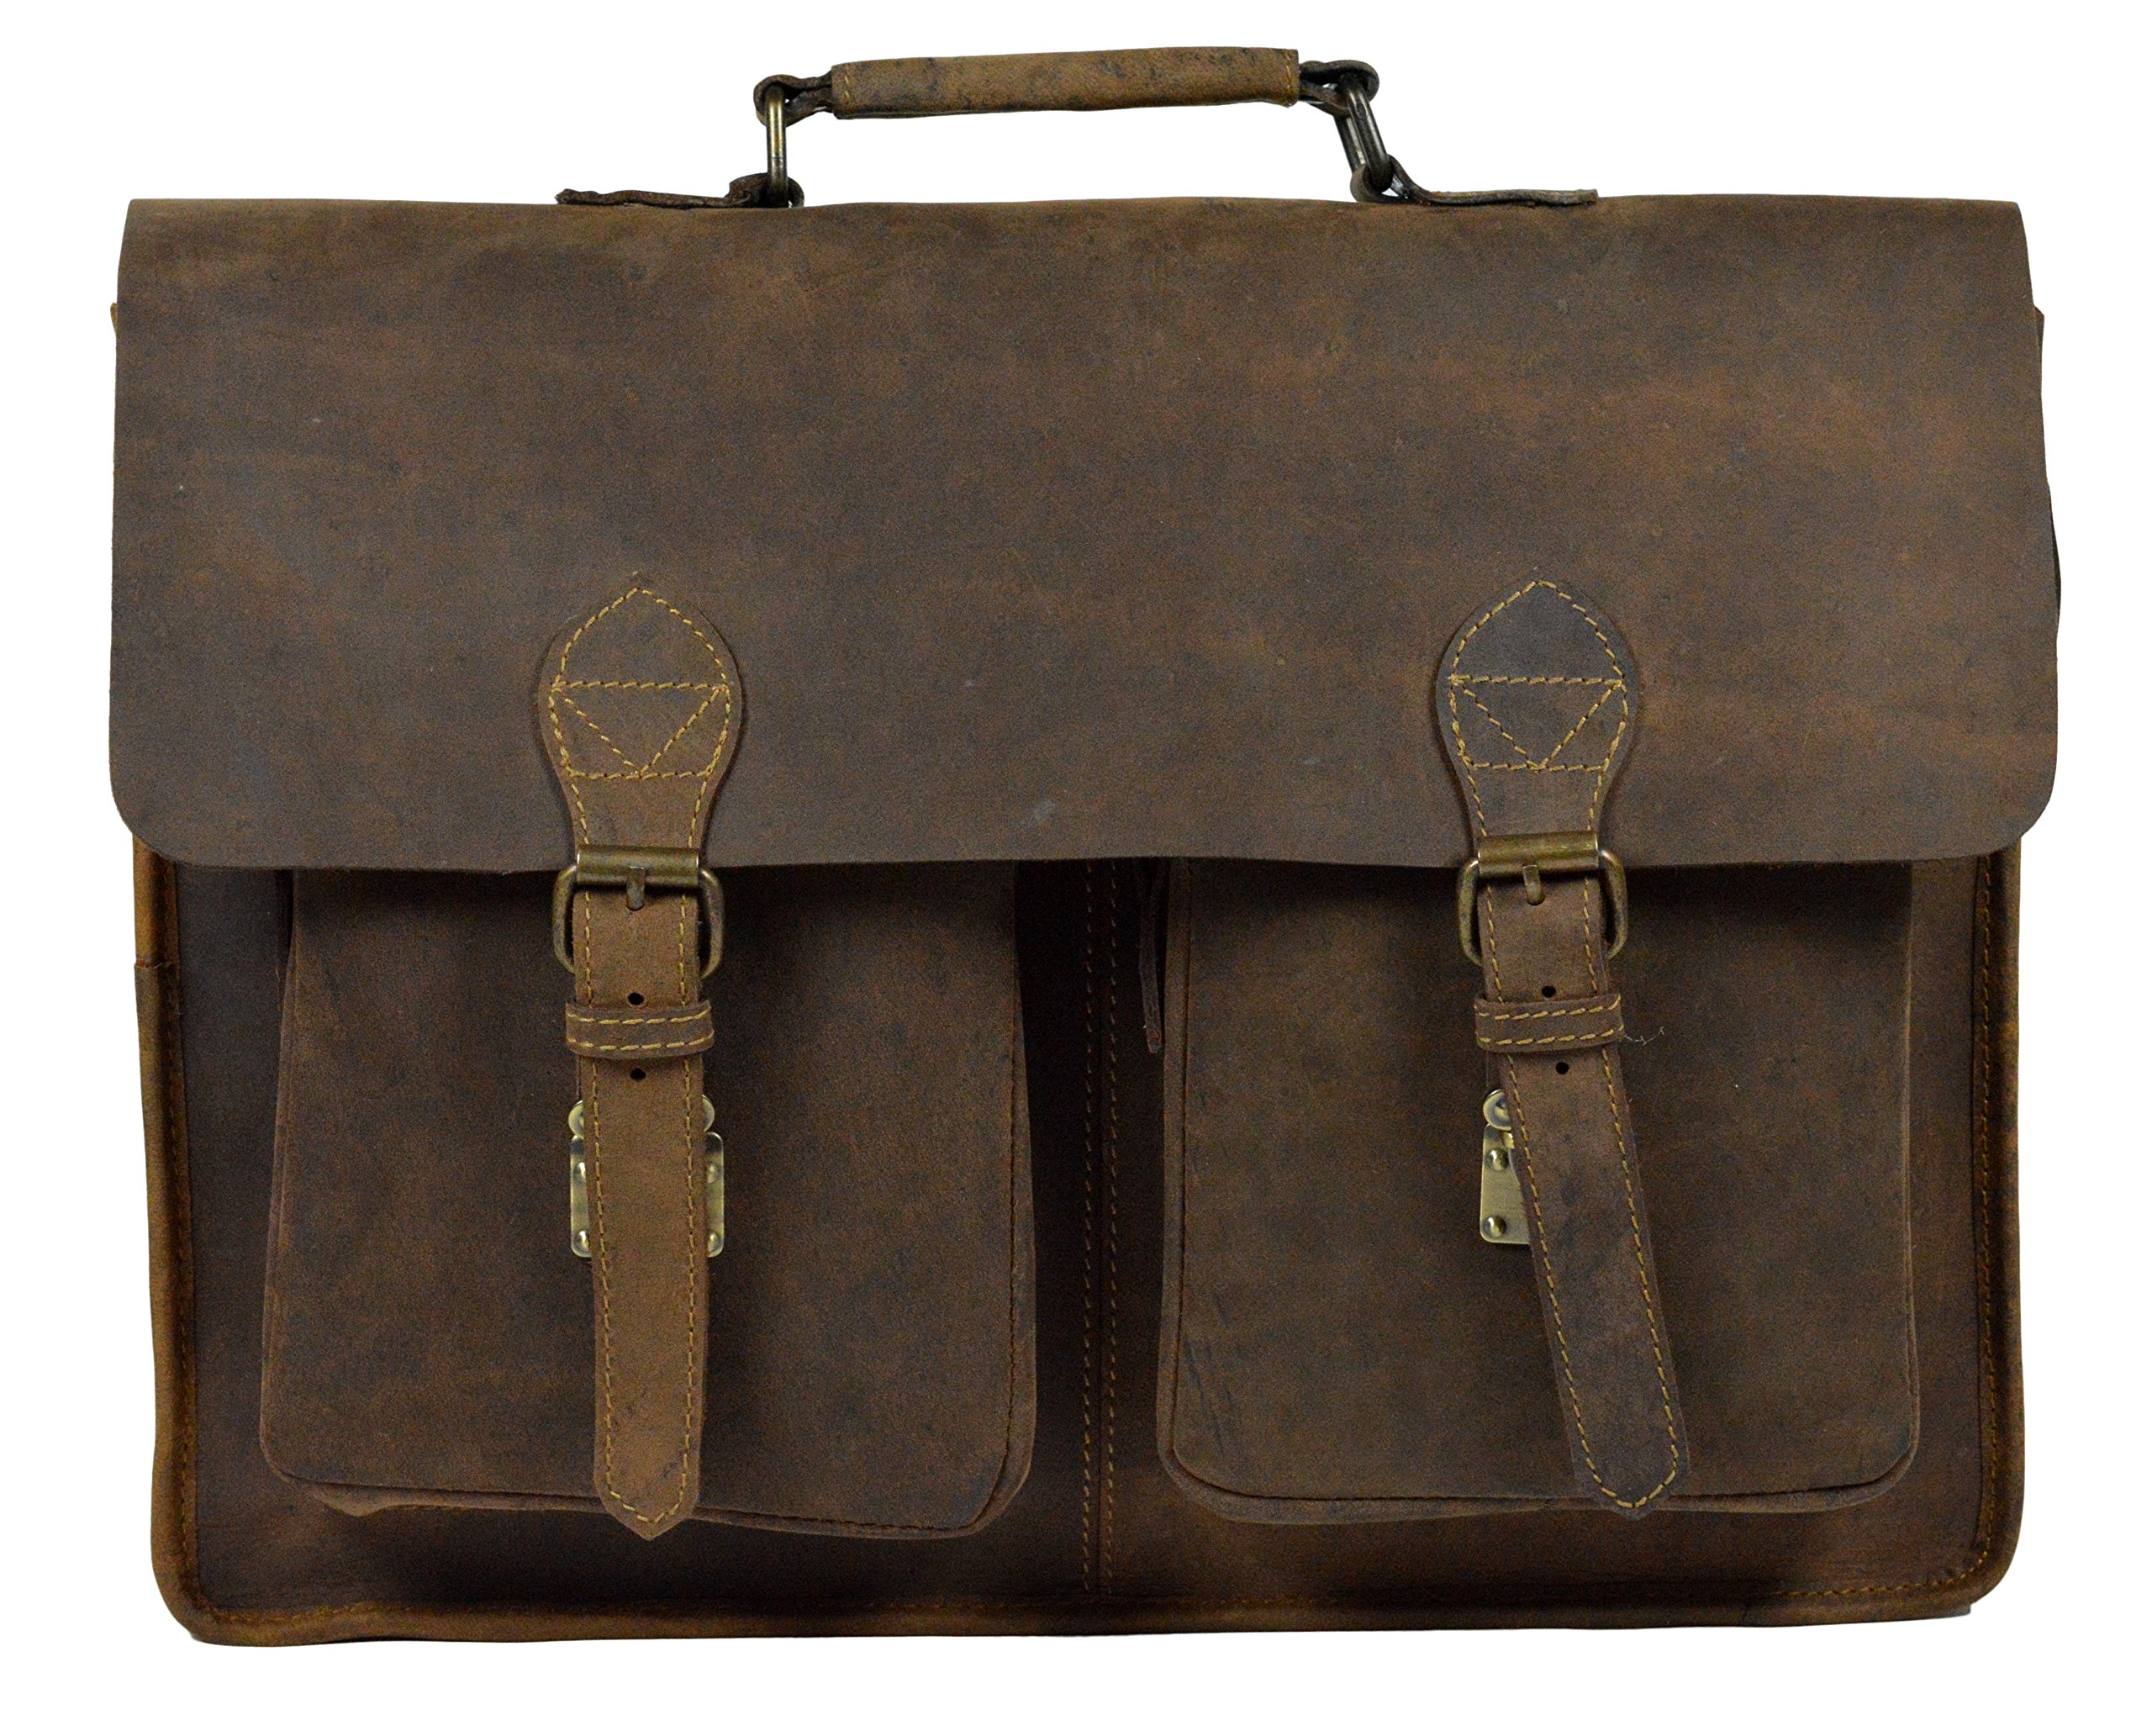 ADIMANI Vintage Crazy Horse Hunter Leather Laptop Briefcase Bag Notebook Case Travel Messenger Bag 16x12 inches Unisex Bag